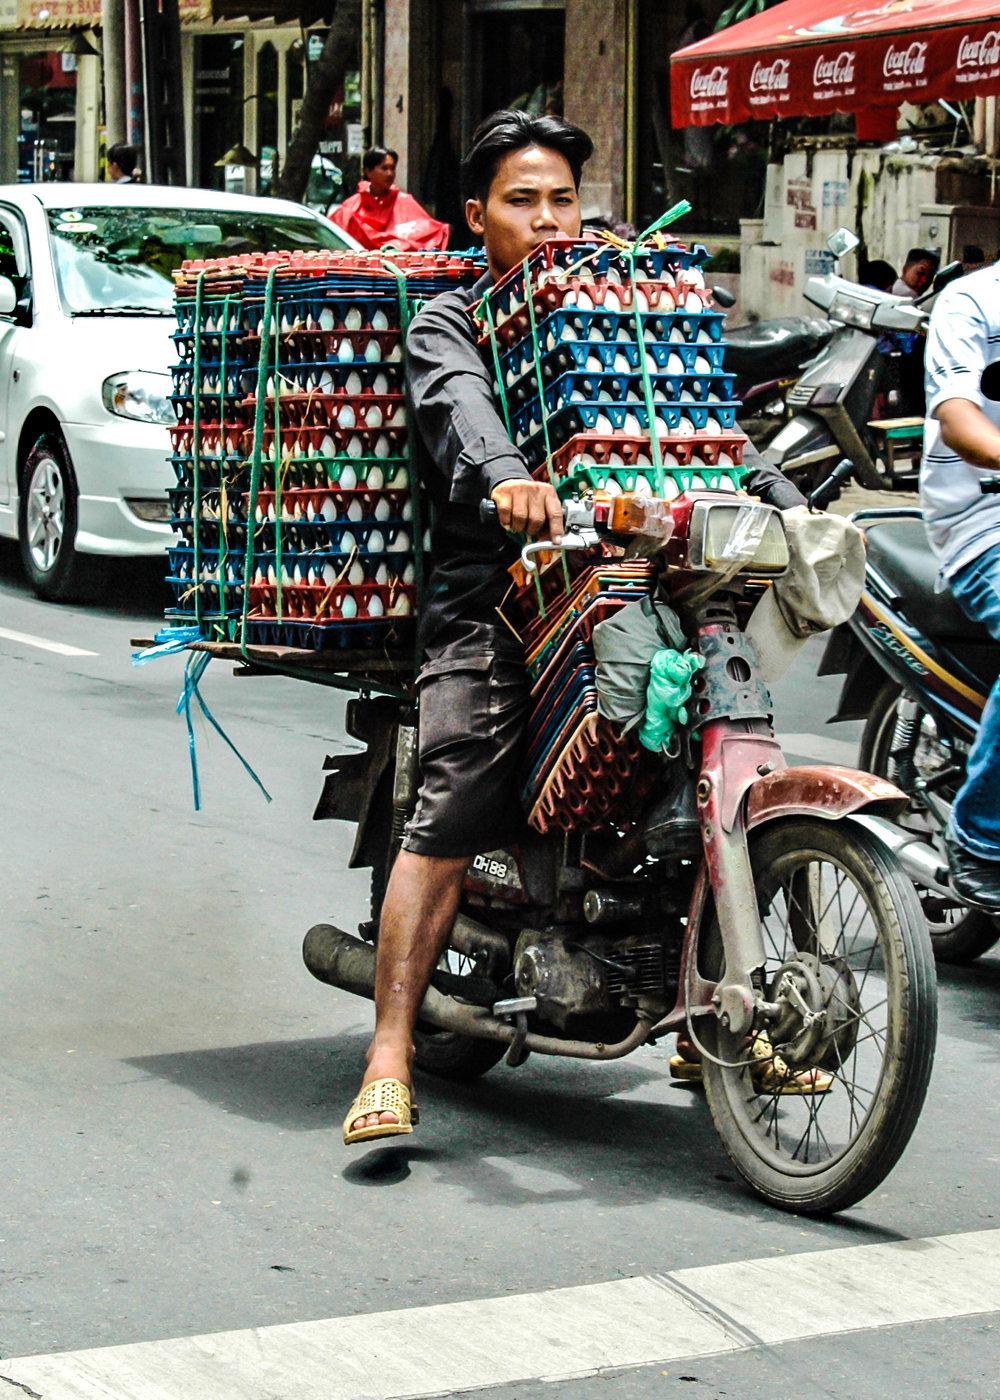 PeopleofVietnam-82.jpg